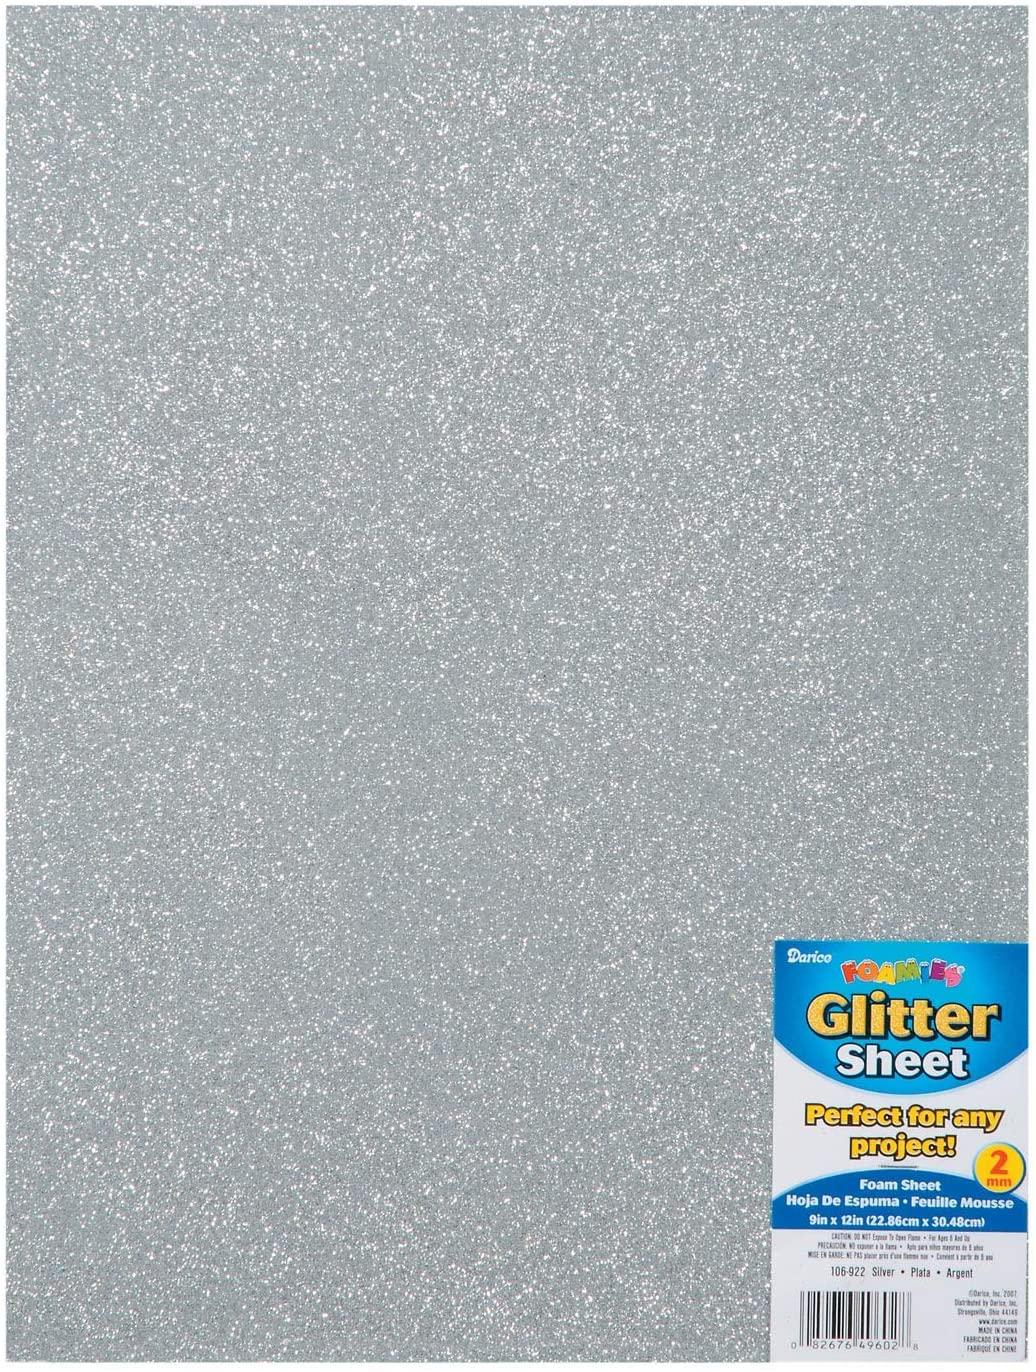 Darice Foamies Glitter Foam Sheet Silver 2mm Thick 9 x 12 inches (3-Pack) 106-922